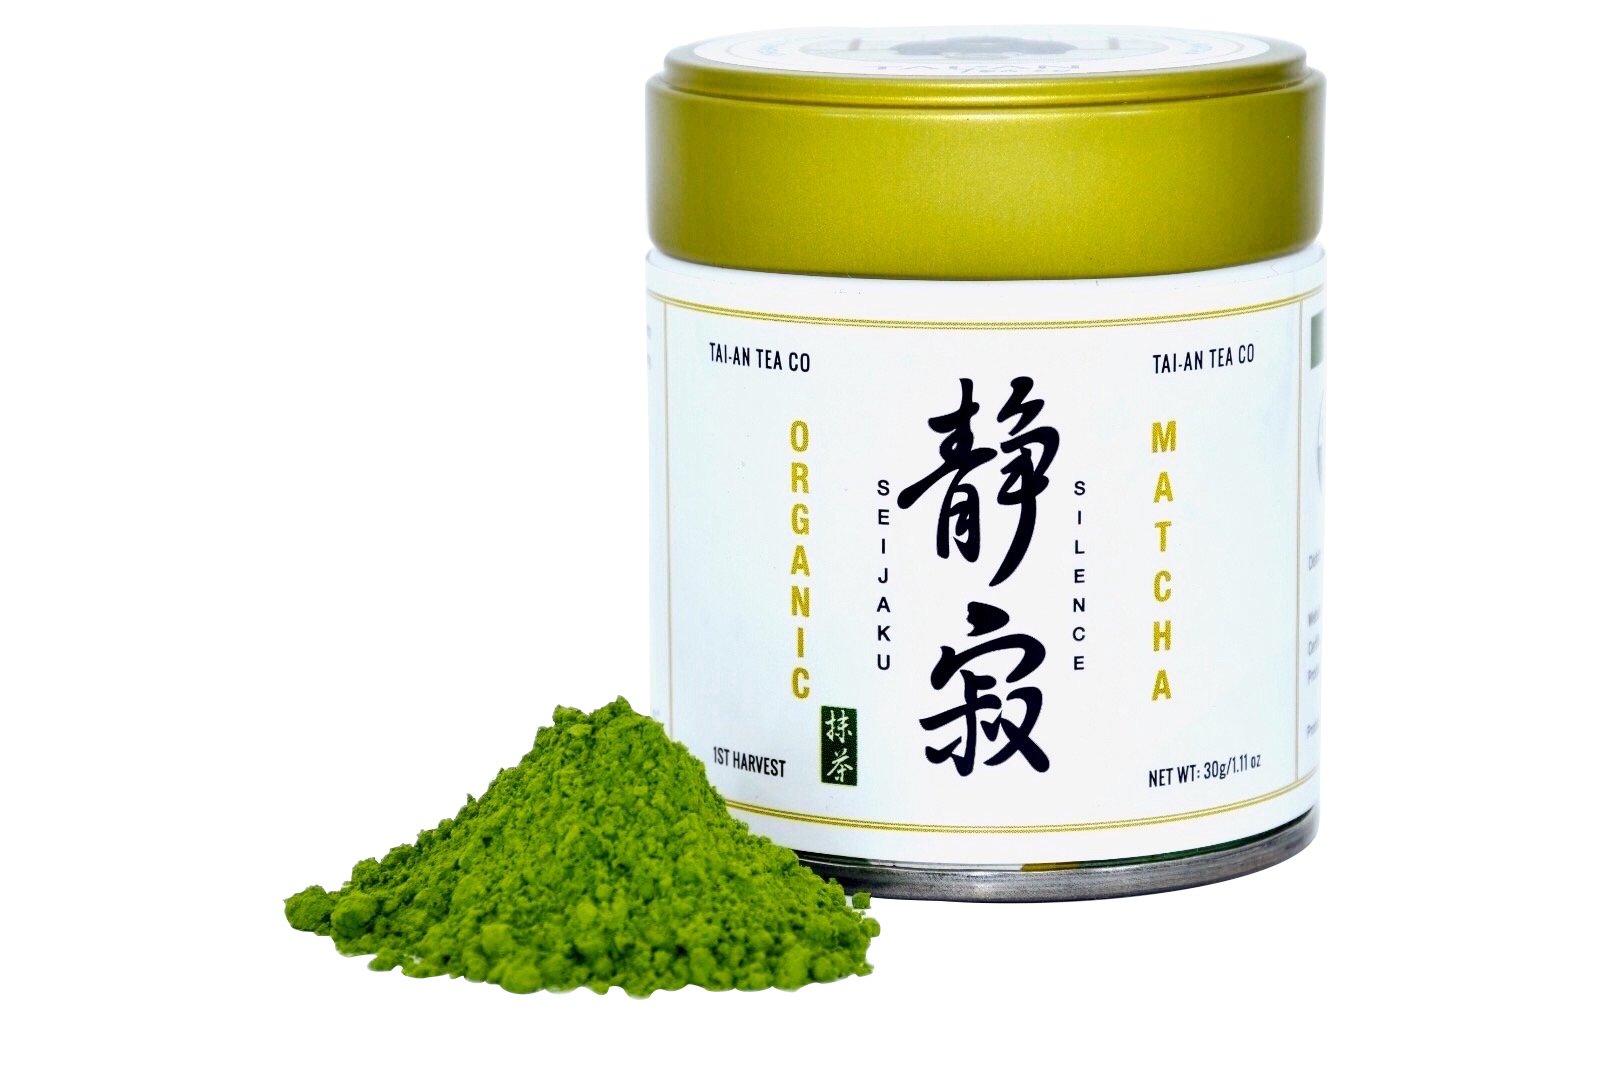 Tai-an Tea Co. Organic Premium Uji-Kyoto Ceremonial Matcha Green Tea-Seijaku(Silence)-30g/1.11oz